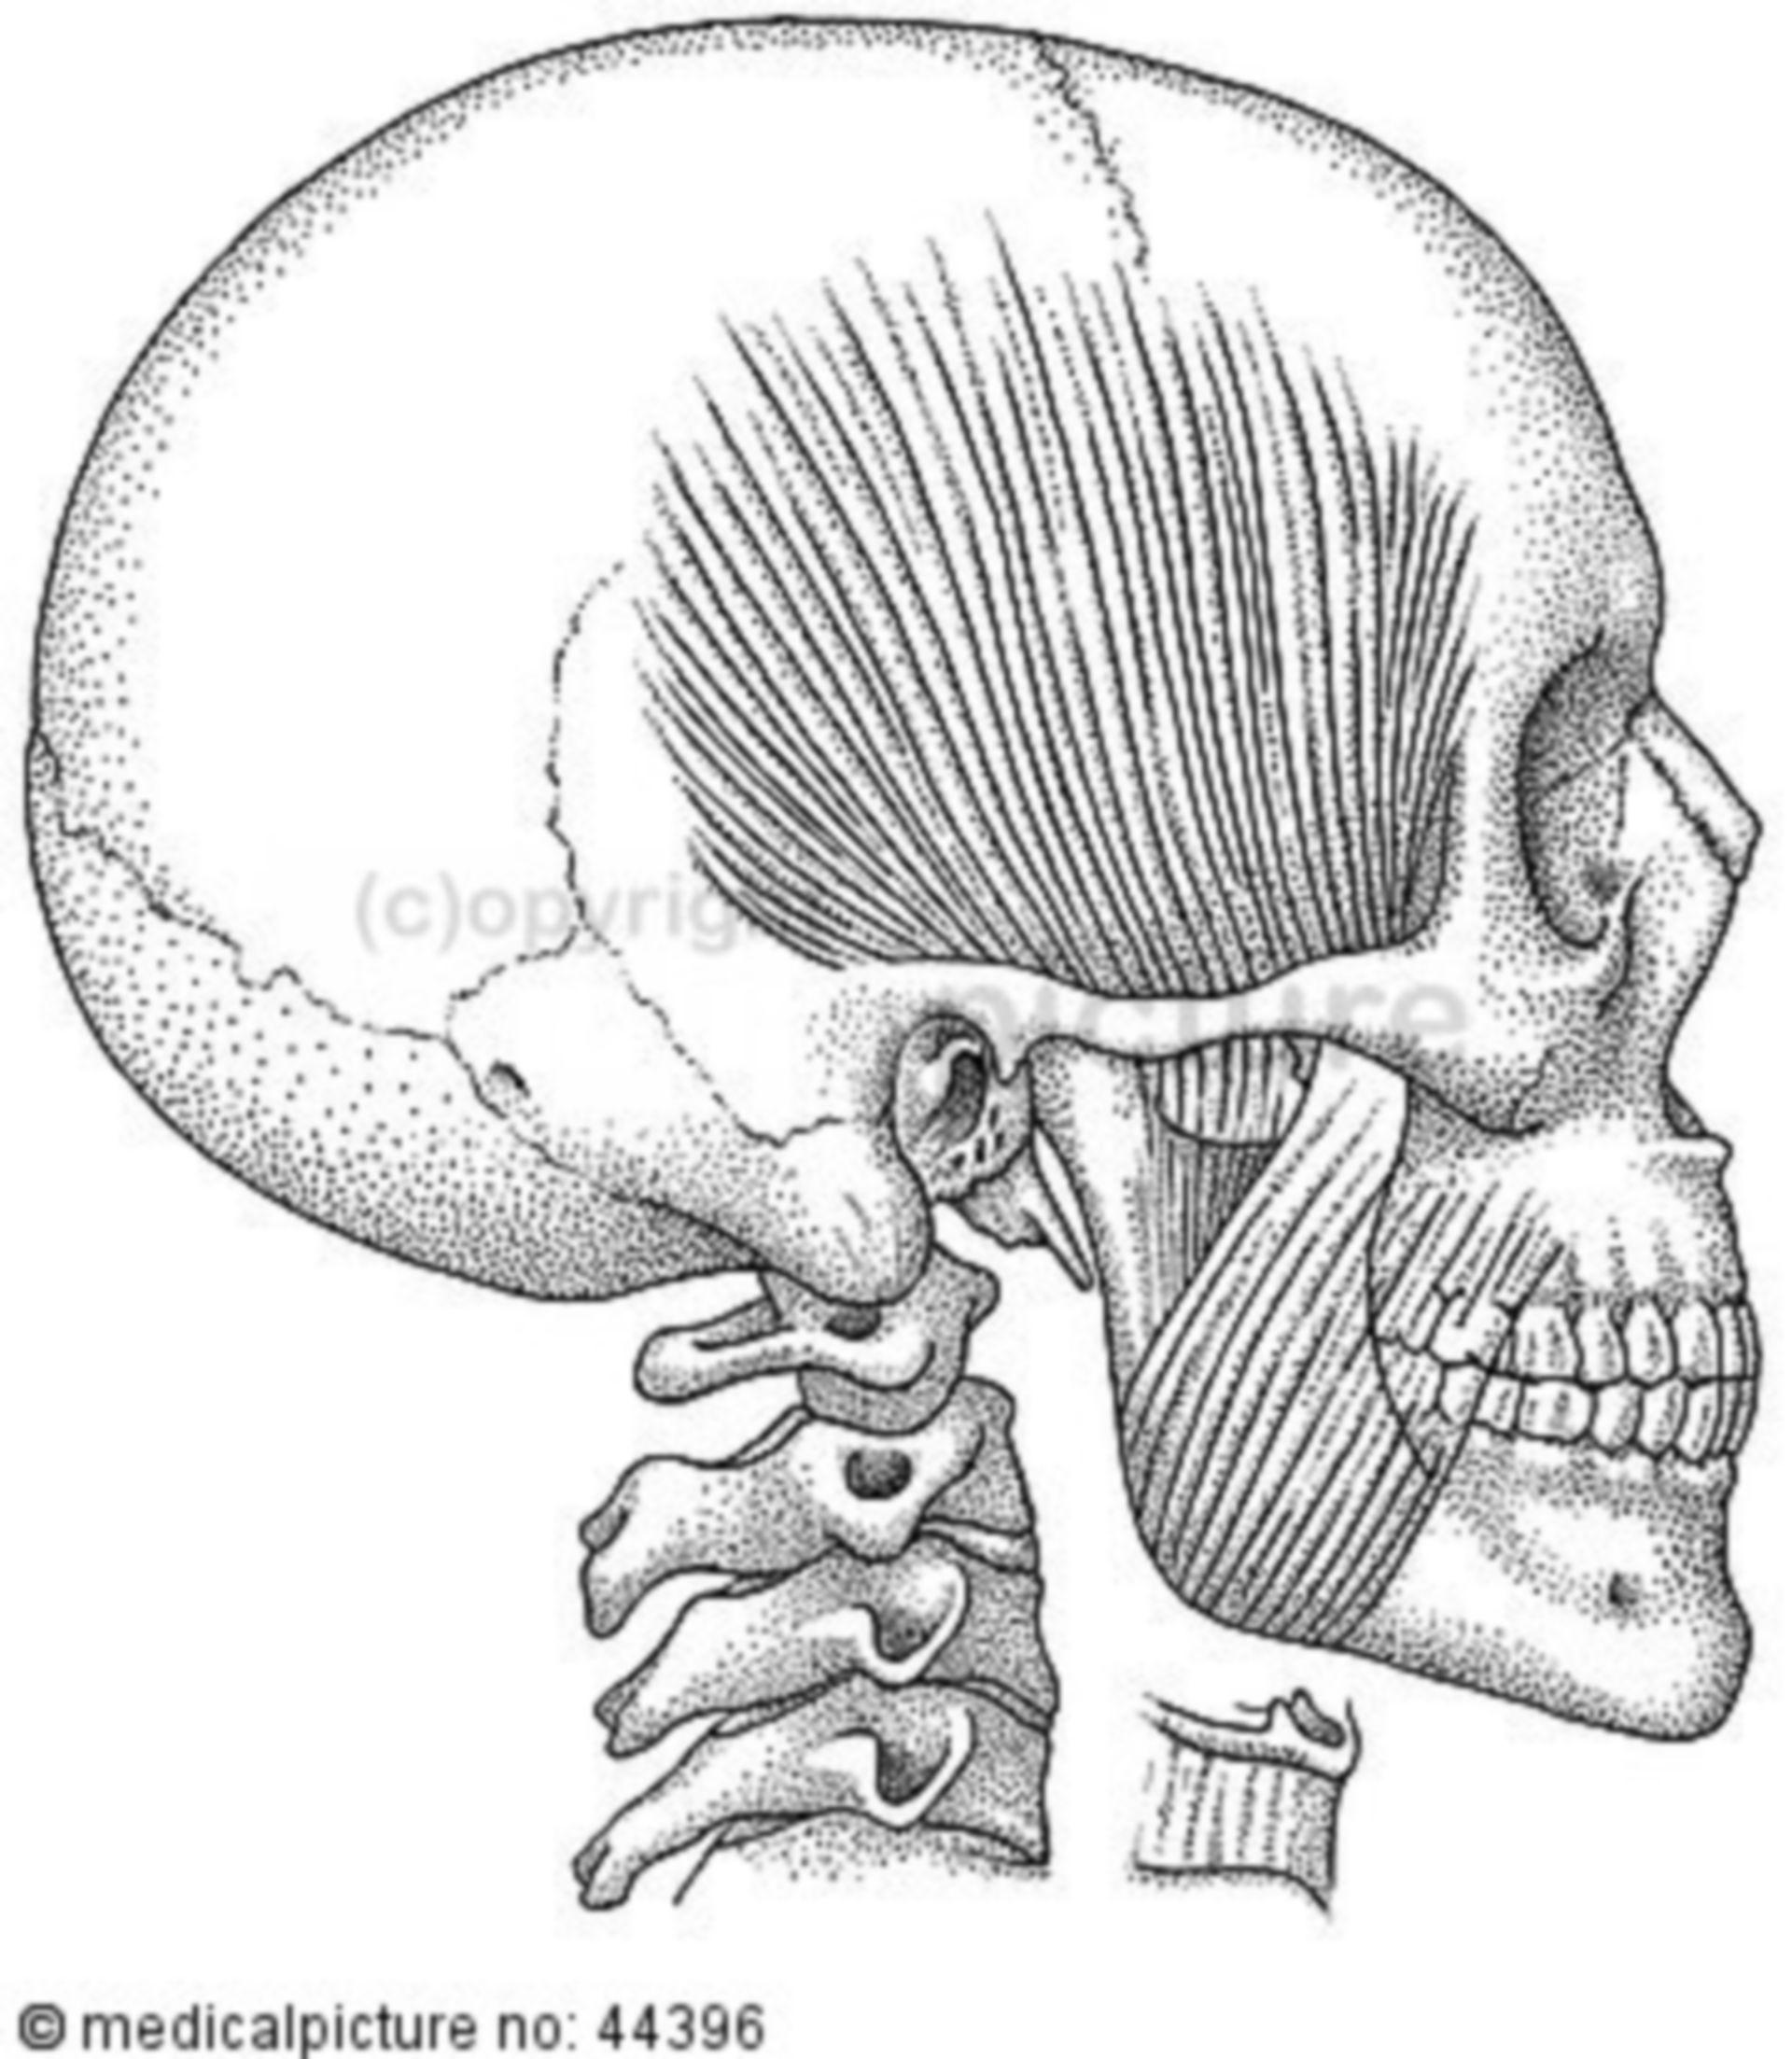 Schädel mit Kaumuskulatur, cranium with muscles of mastication